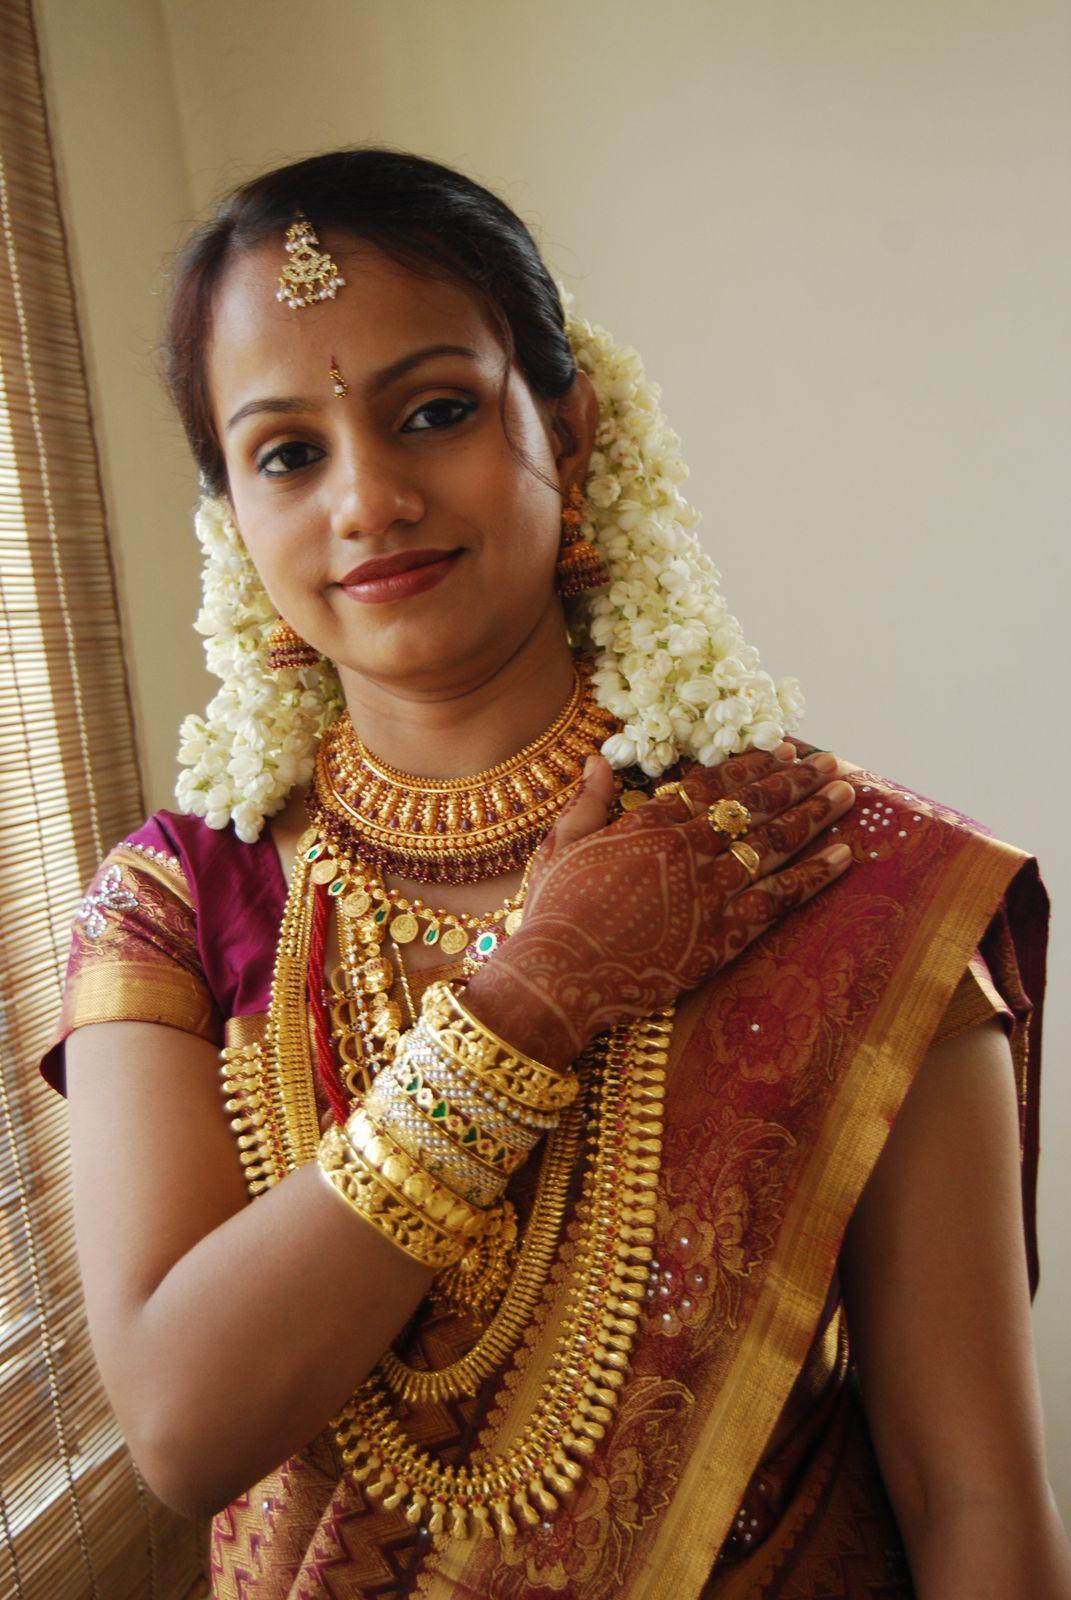 Kerala Bride | Indian bridal wear, Indian bridal, South indian bride